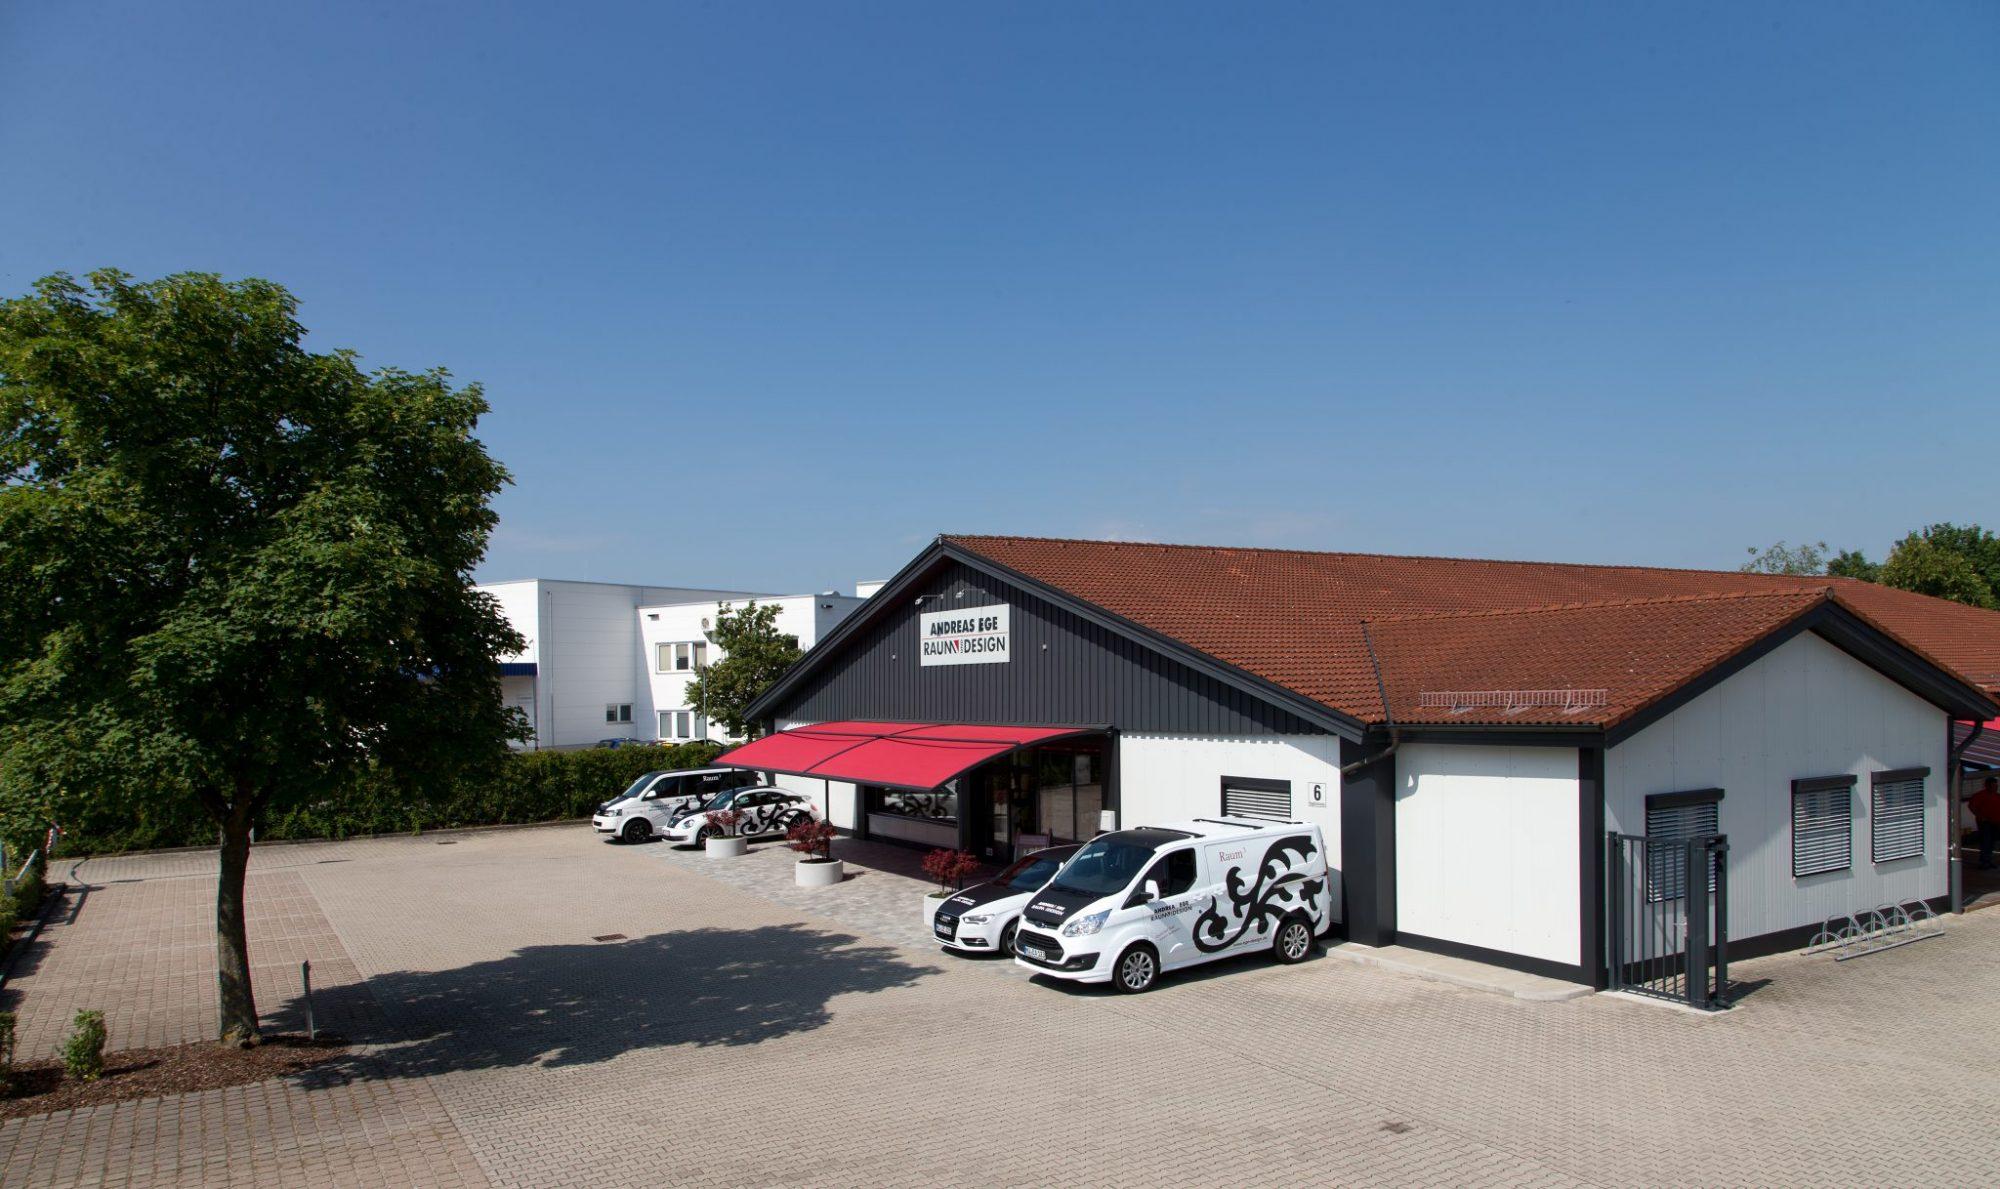 Meisterbetrieb andreas ege raum design m hldorf for Raum design